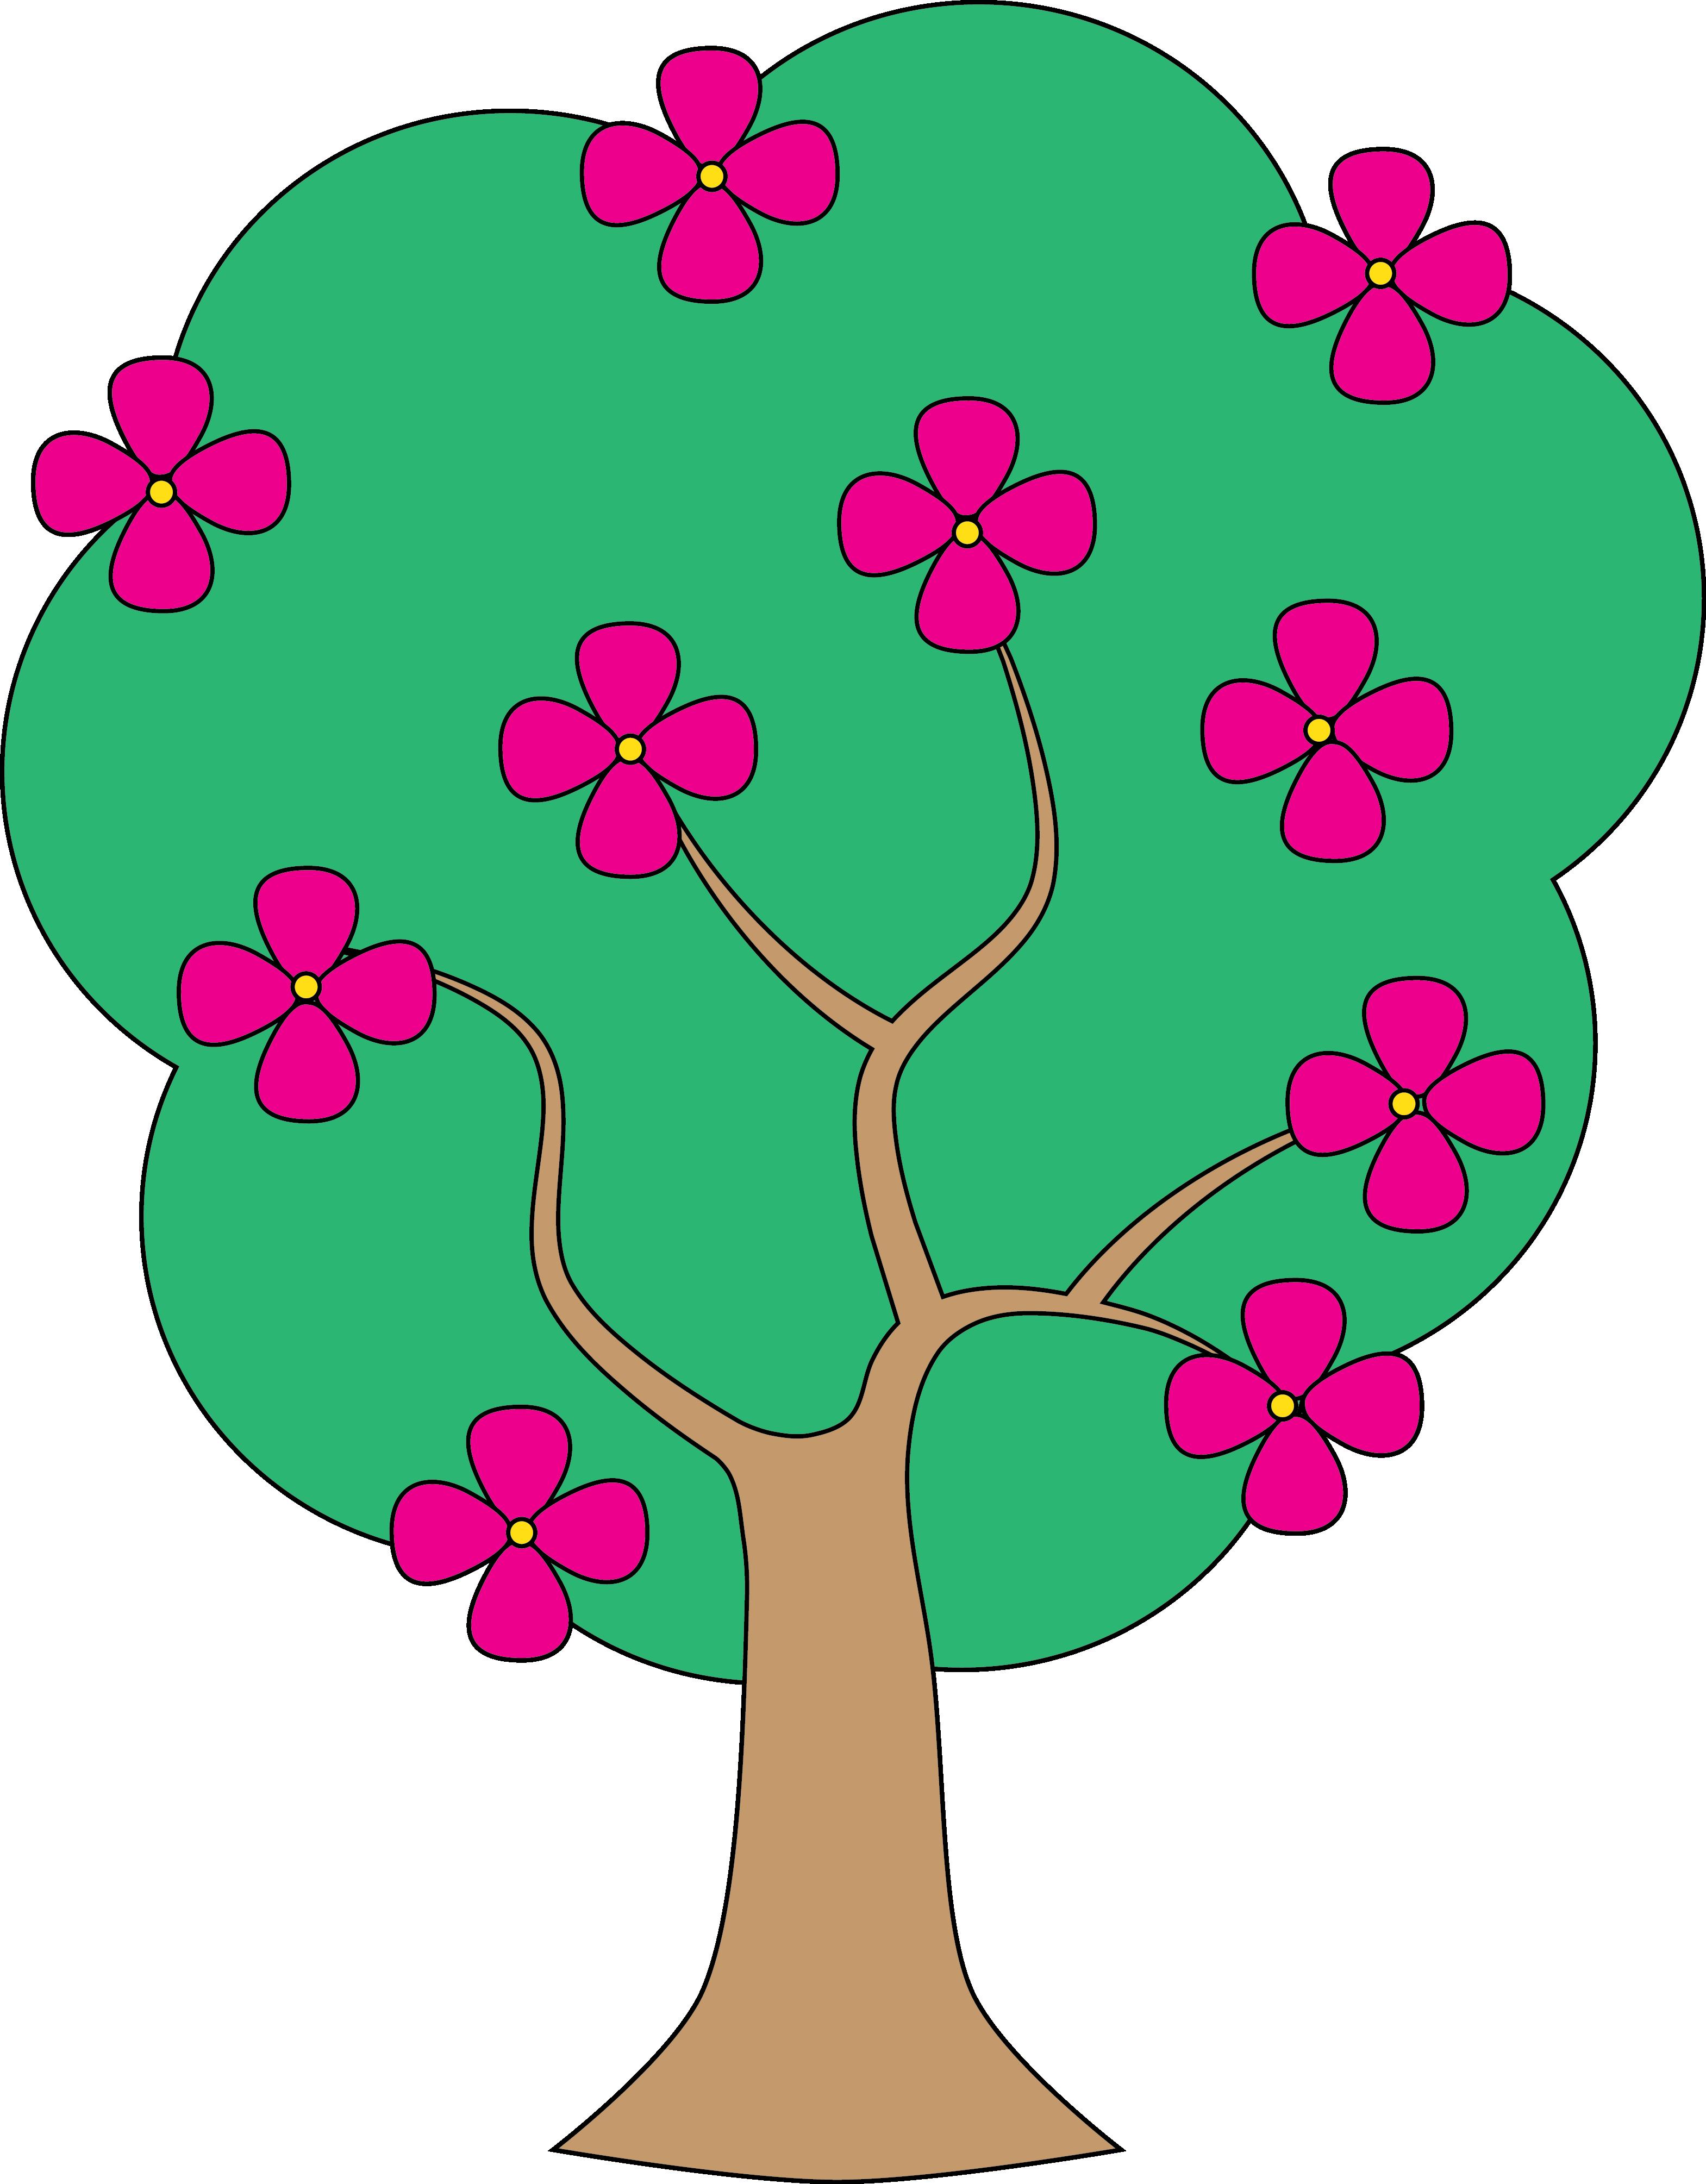 Tree clipart apple blossom #1